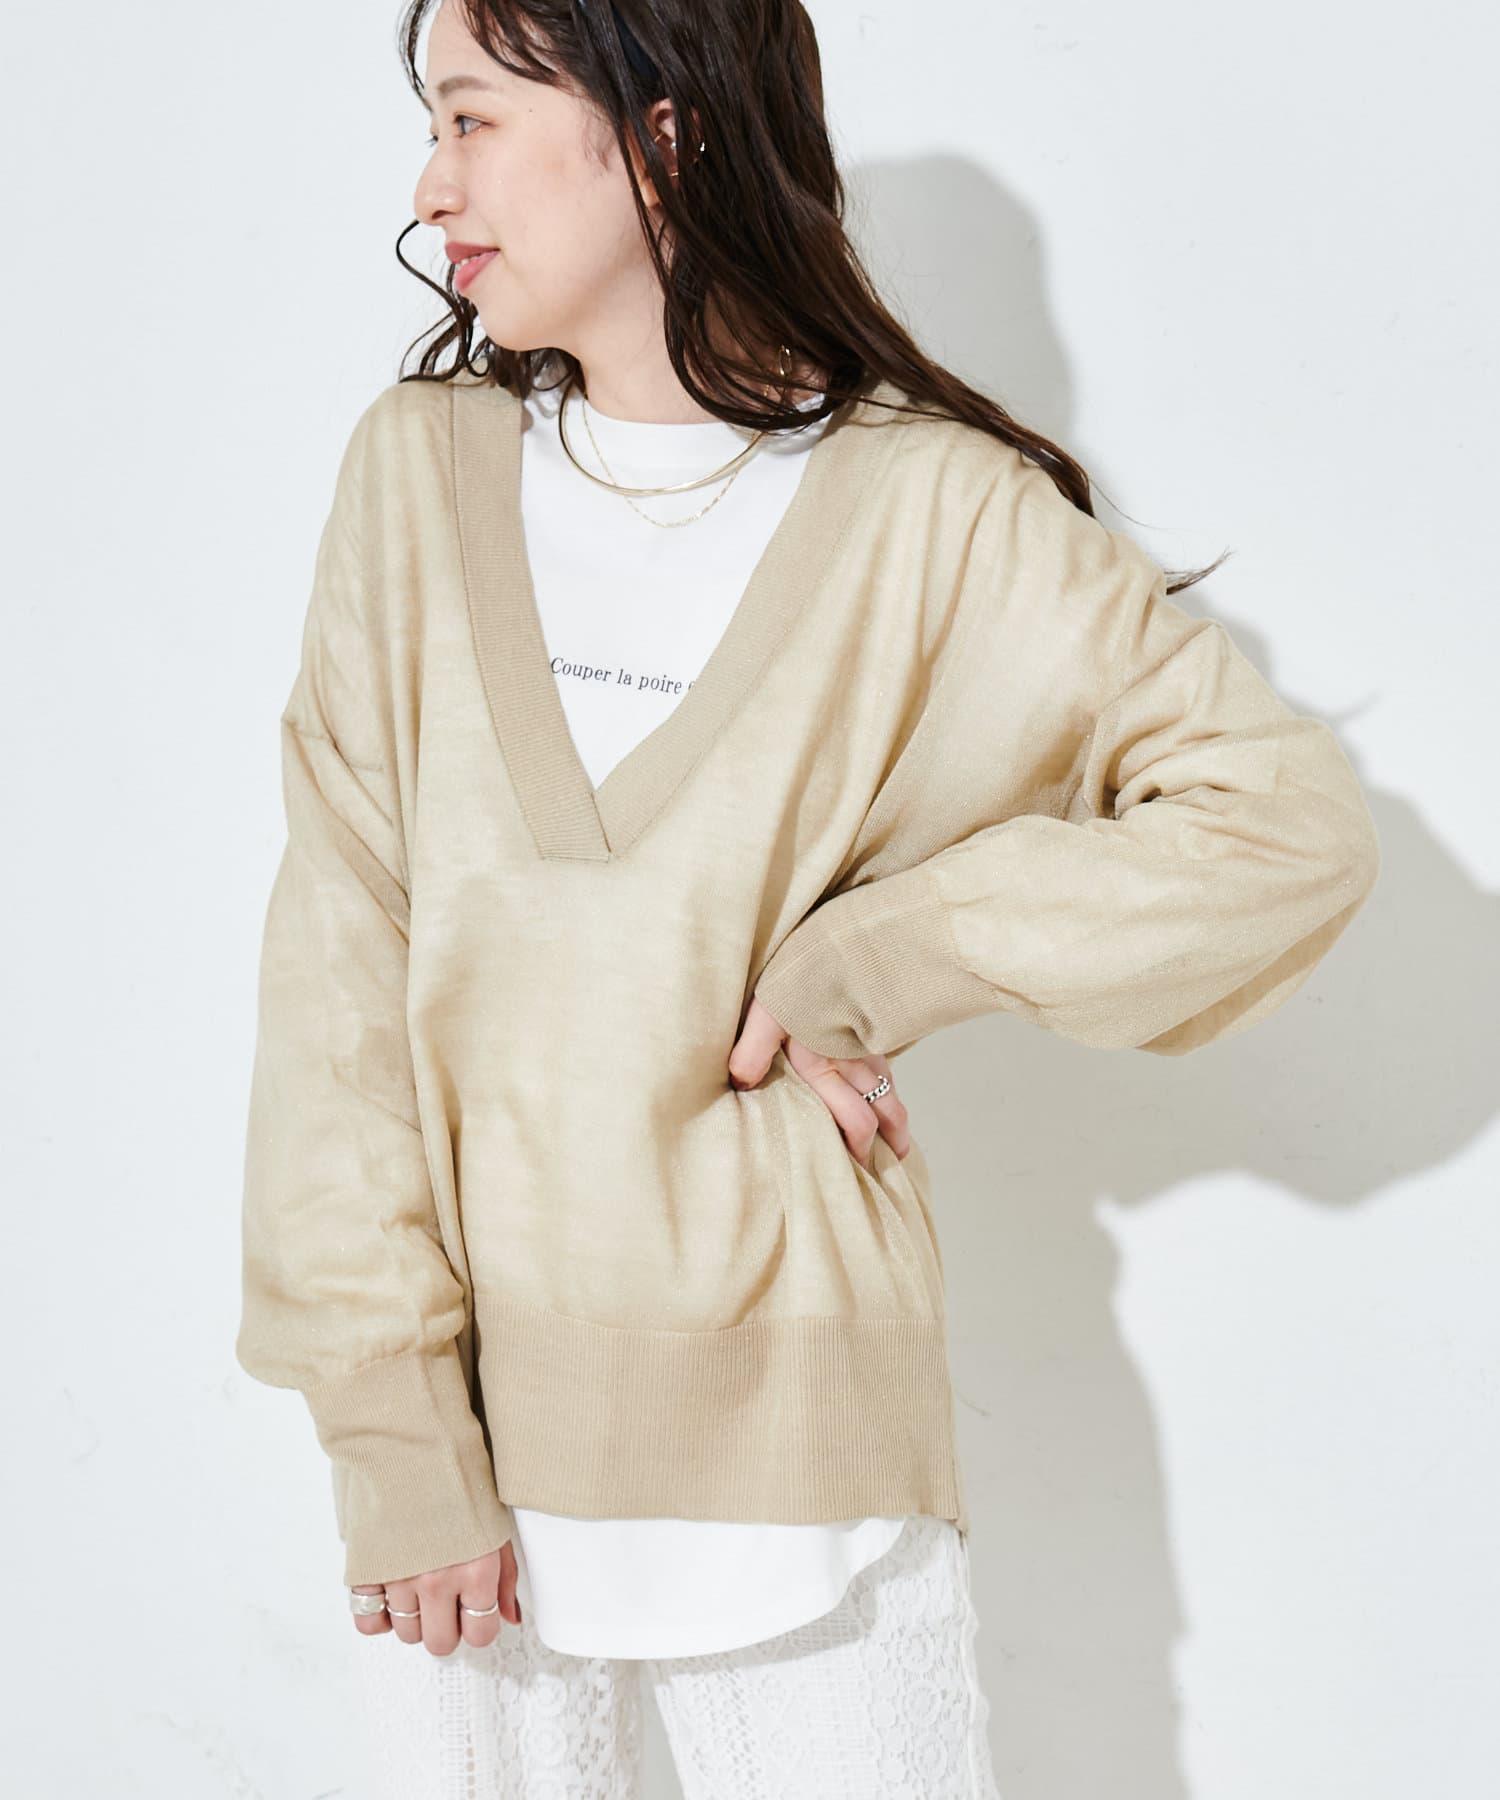 Discoat(ディスコート) レディース 【SET ITEM】シアーニット×ロングTシャツ ライトグレー